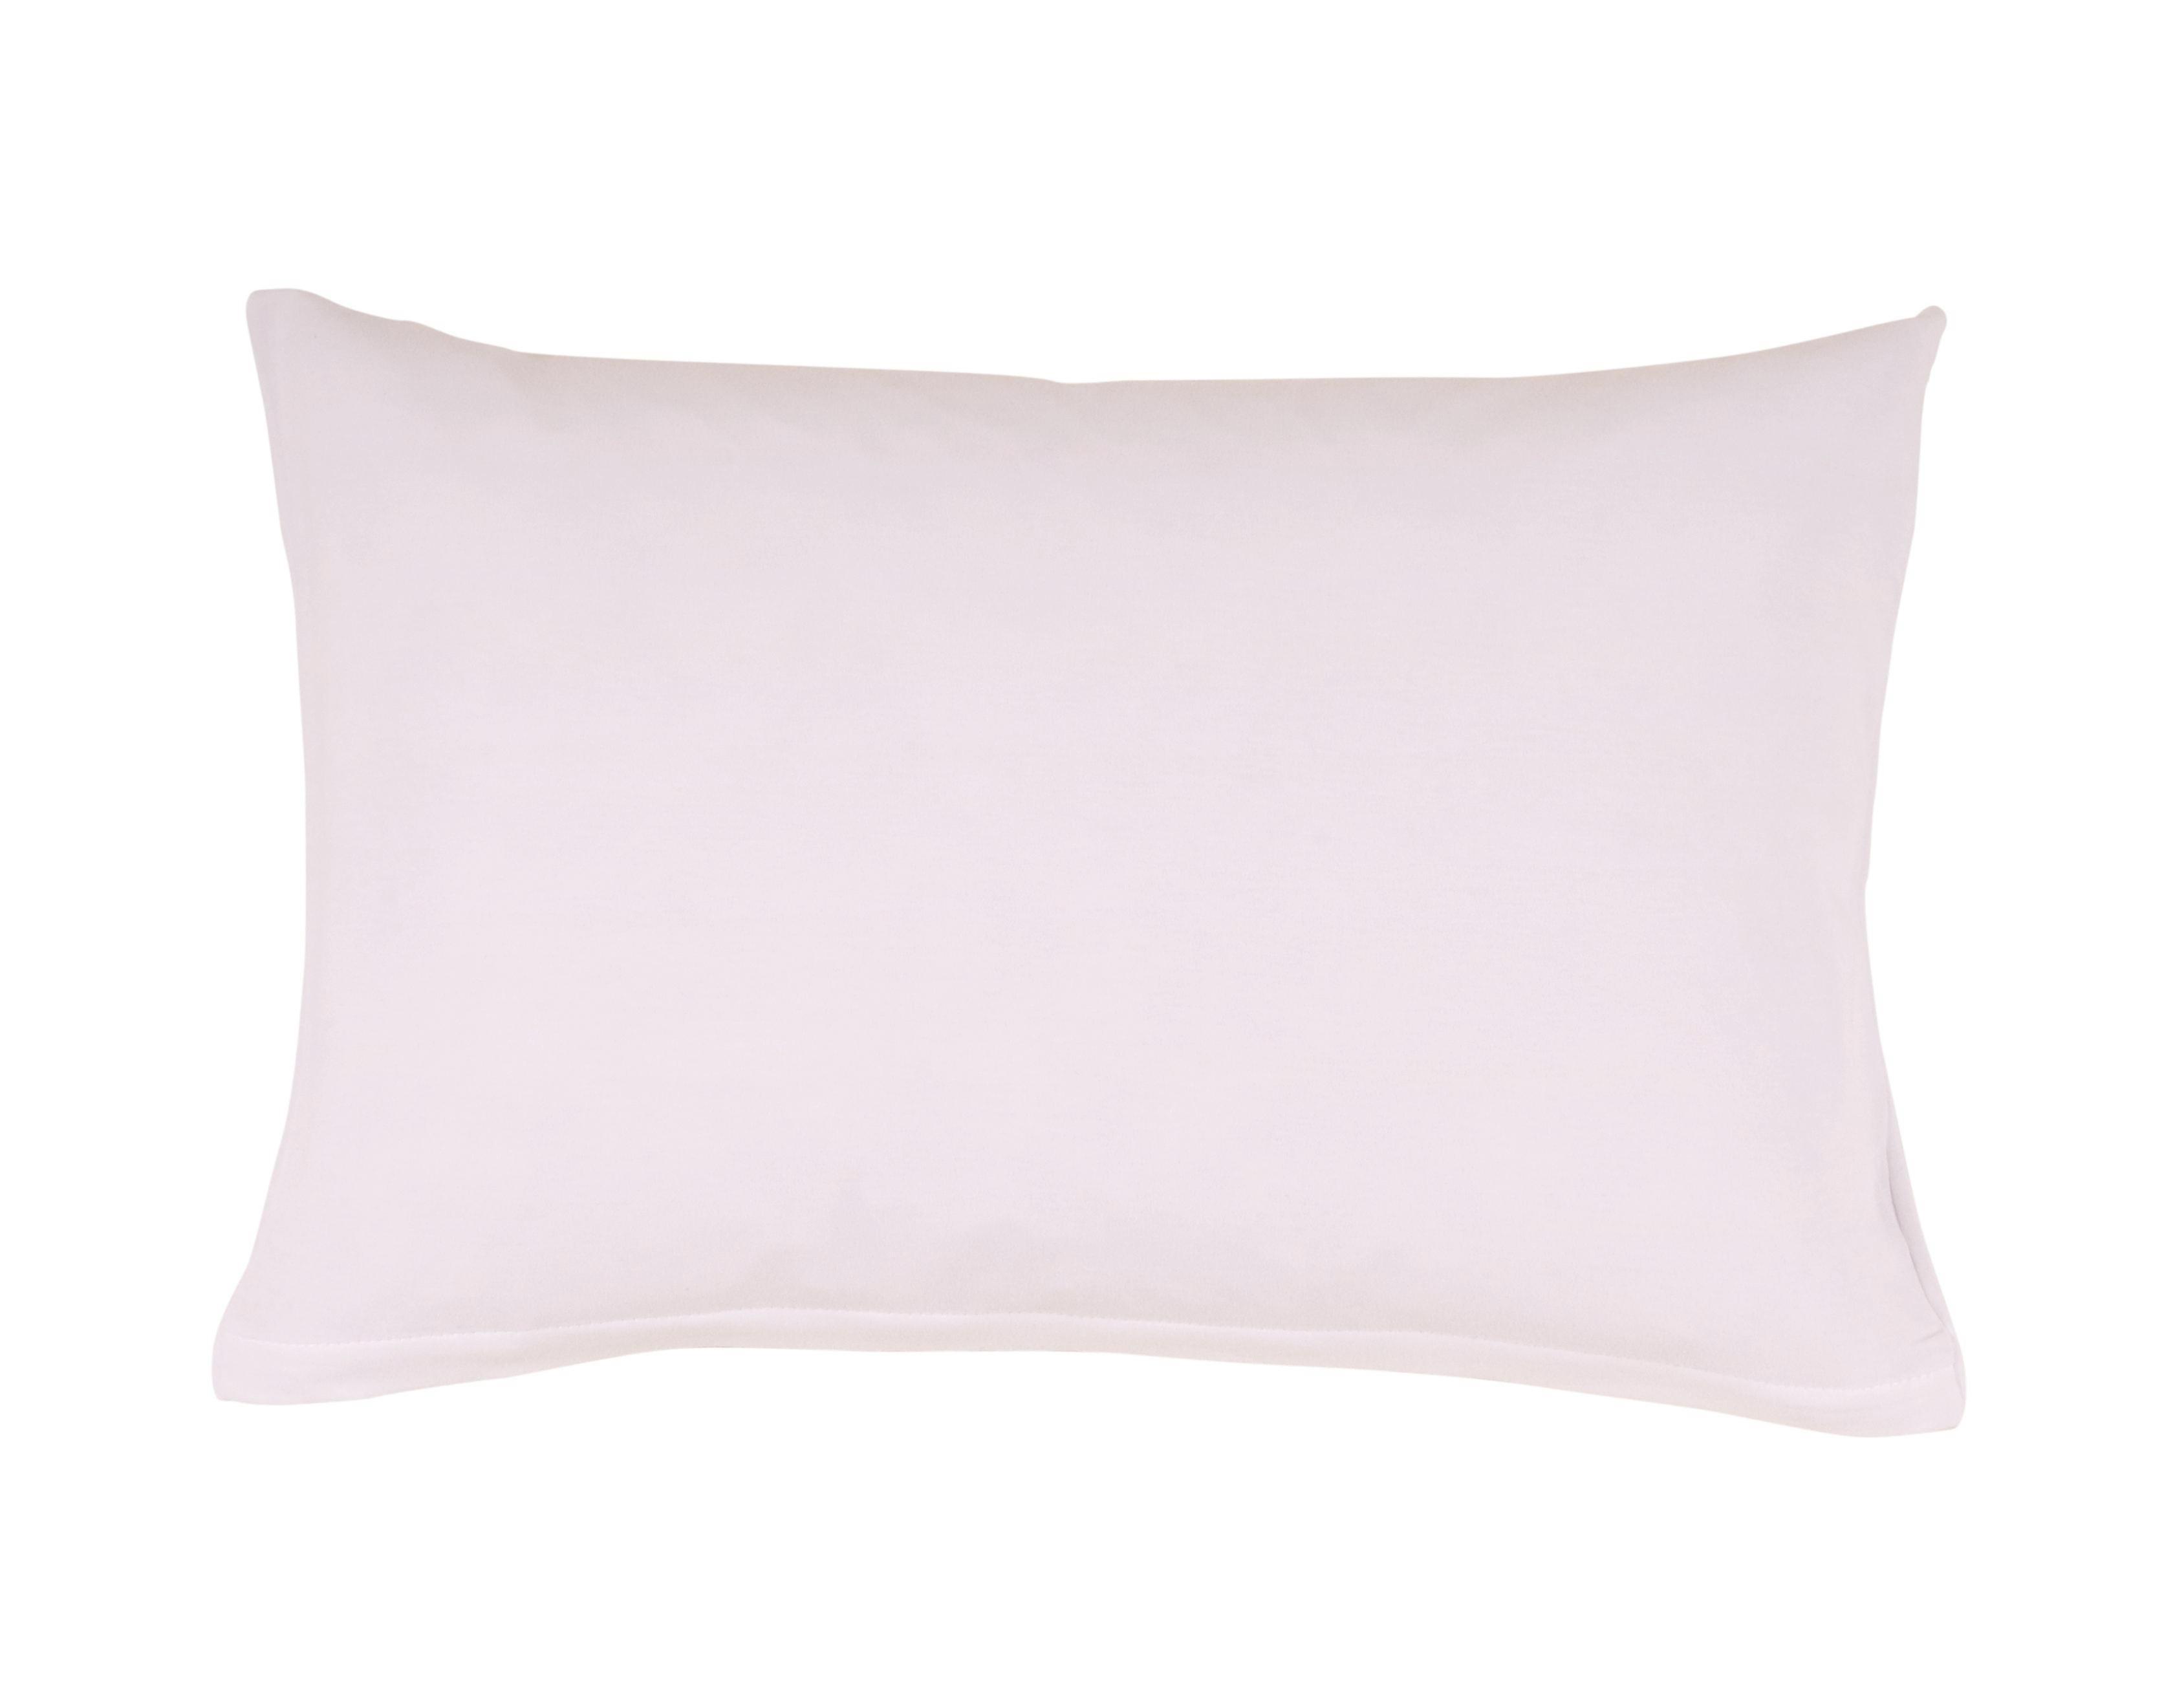 KISSENHÜLLE 40/80 cm - Weiß, Basics, Textil (40/80cm) - SCHLAFGUT